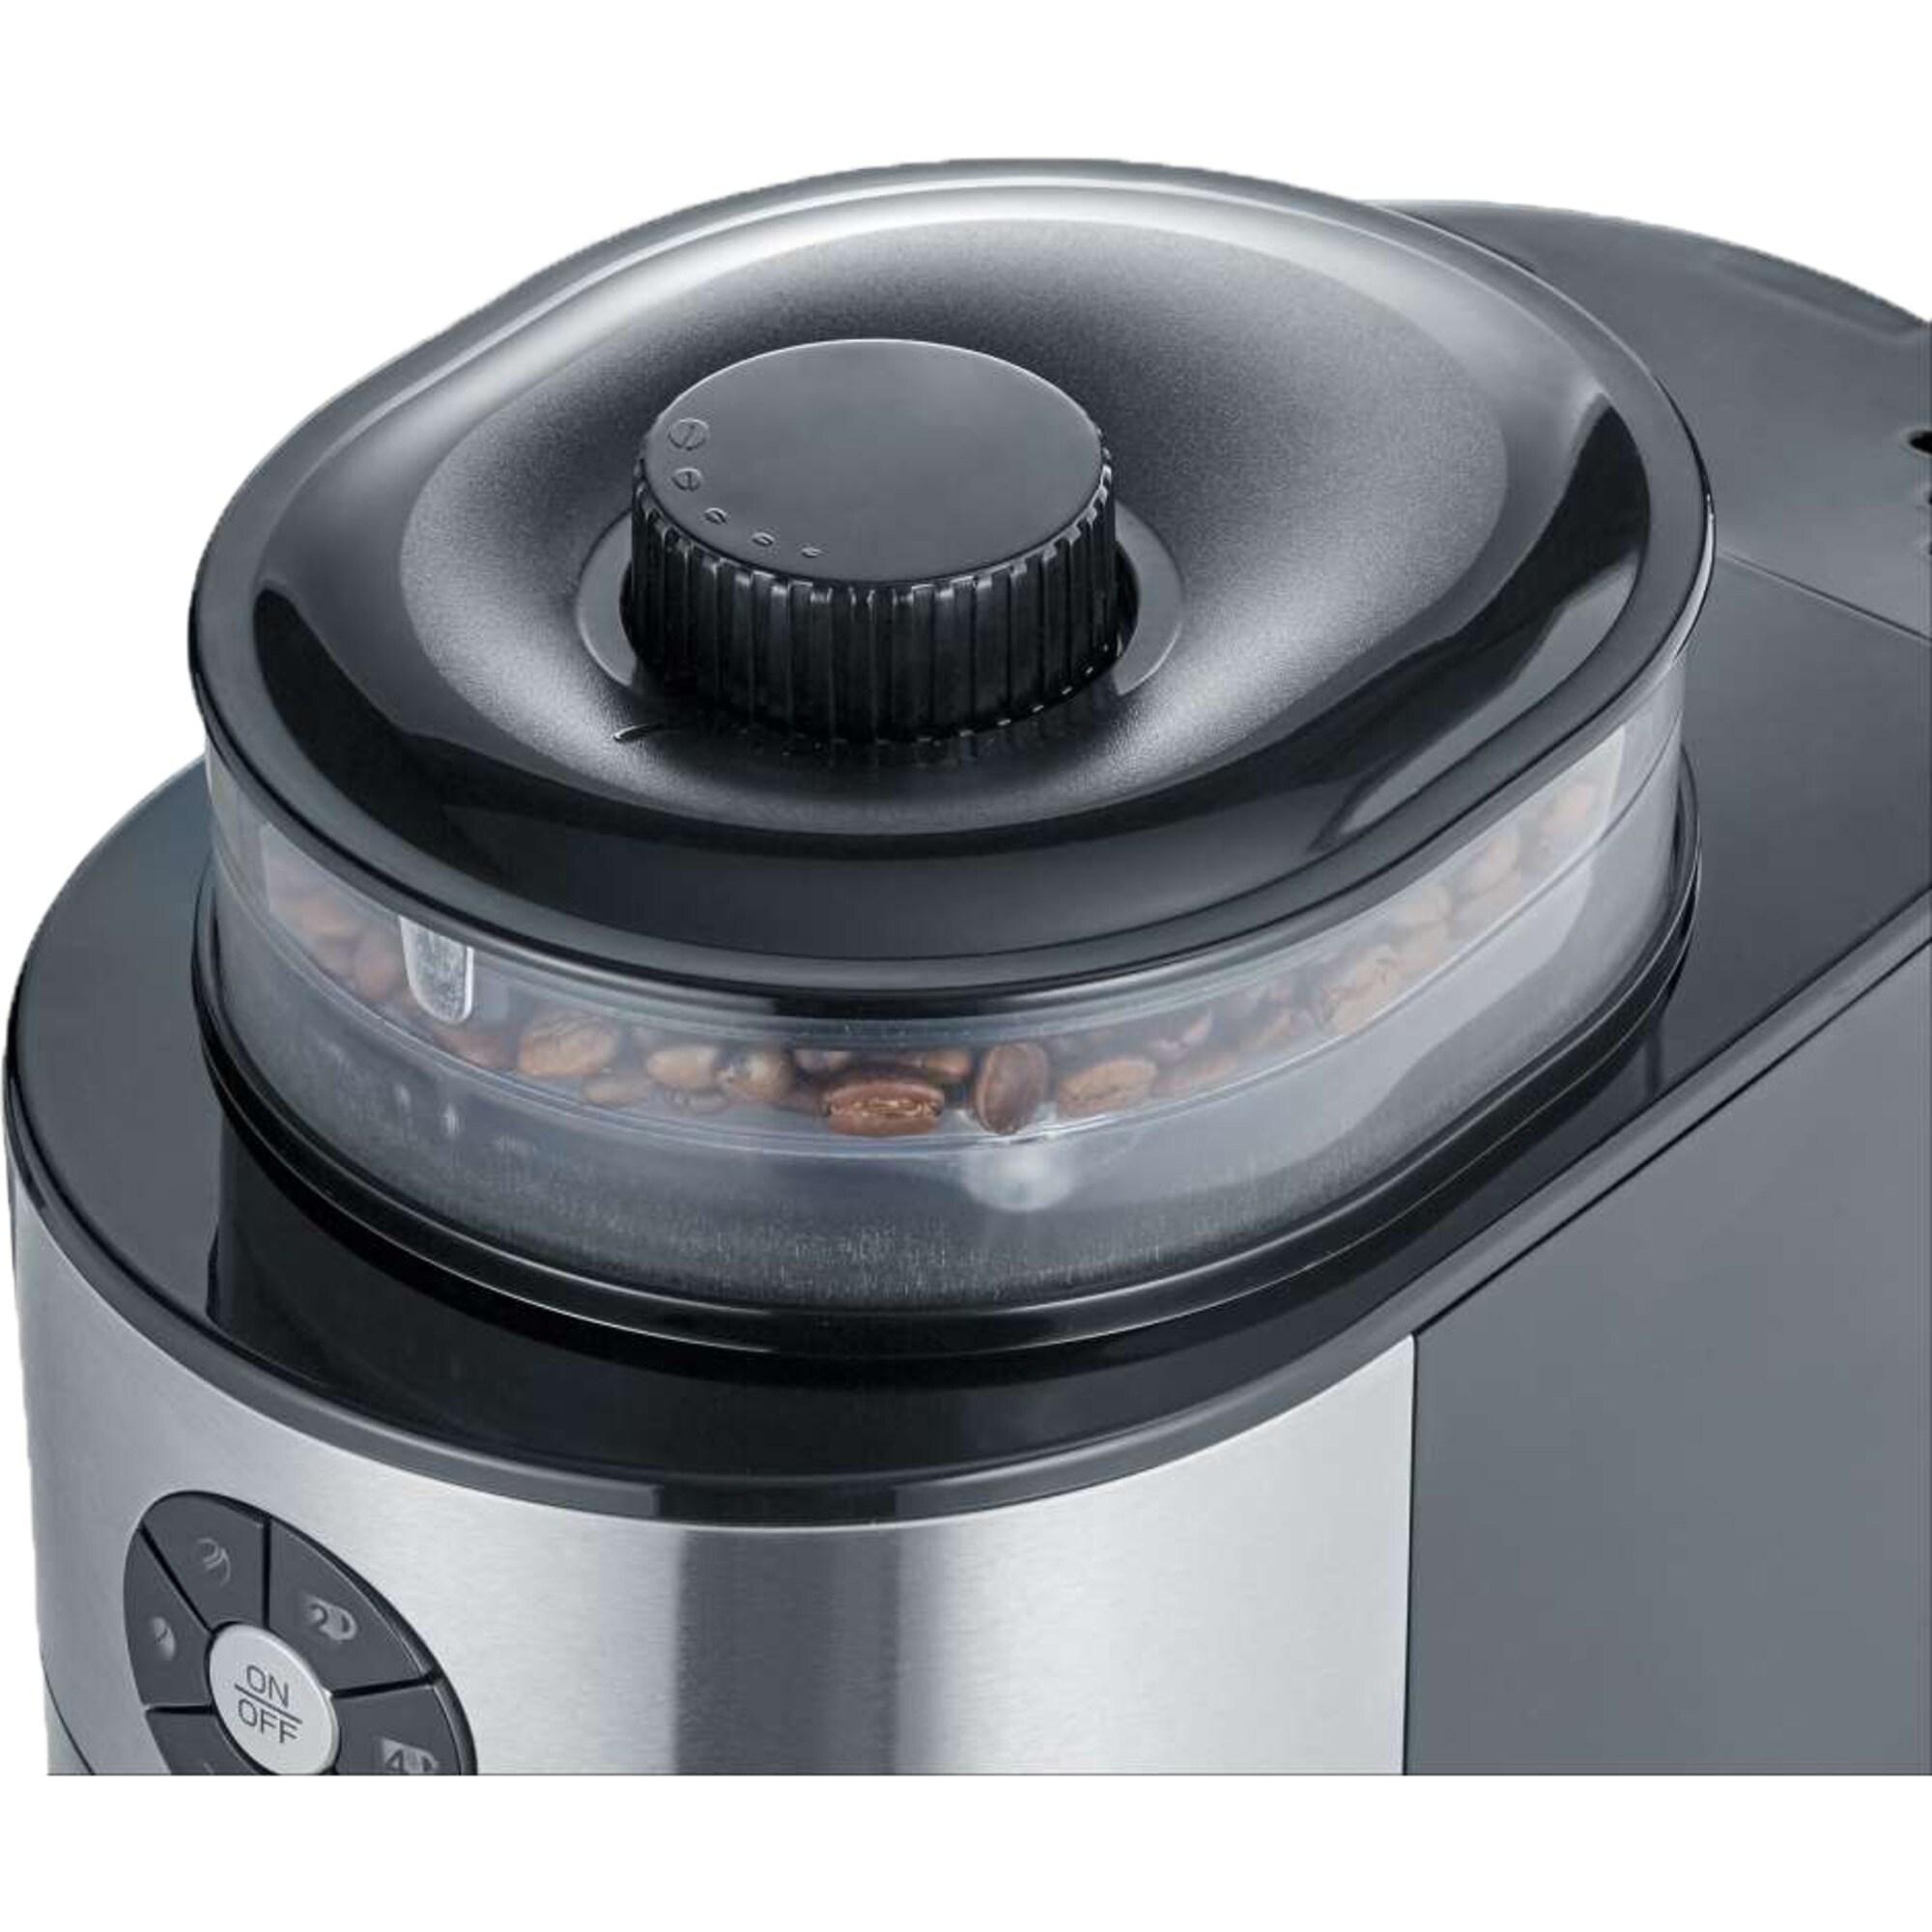 Severin Filtermaschine KA 4811 schwarz